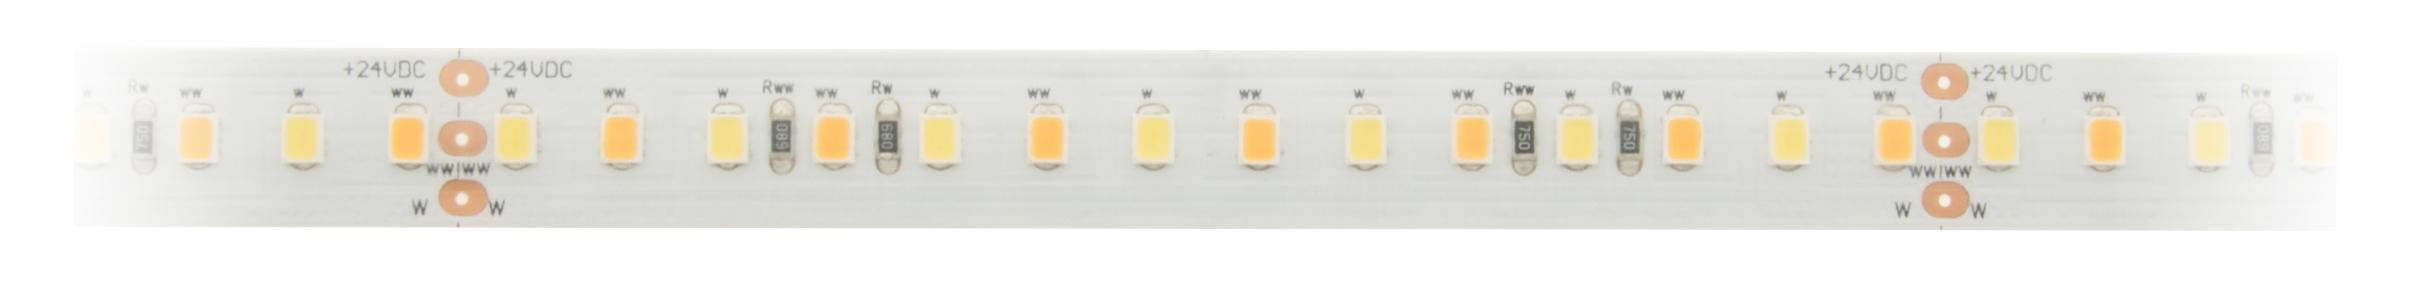 1 Stk FS 72, DW, 100% MIX, 17,5W/m, 1380lm/m, 24VDC, IP44, l=5m LIFS005104